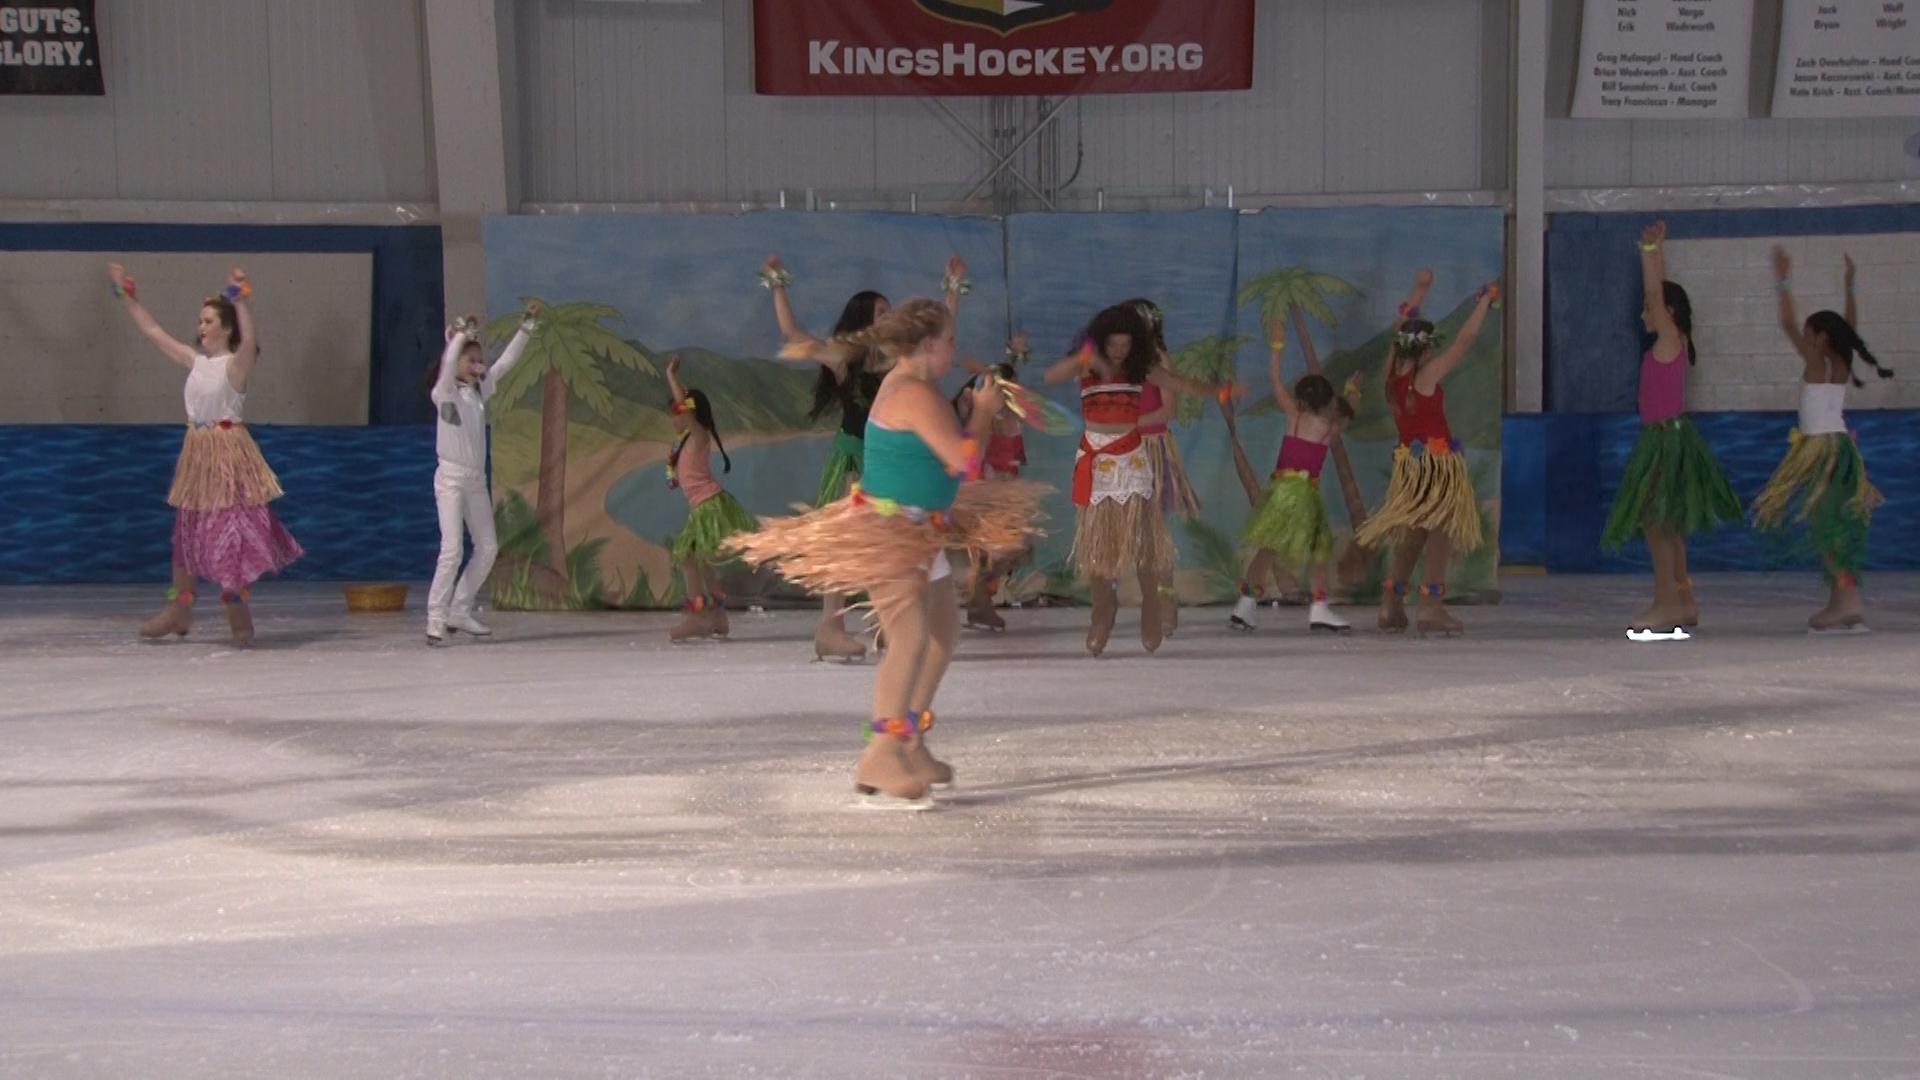 Power Play Maui Skate on Ice 071417.00_13_03_18.Still022.jpg